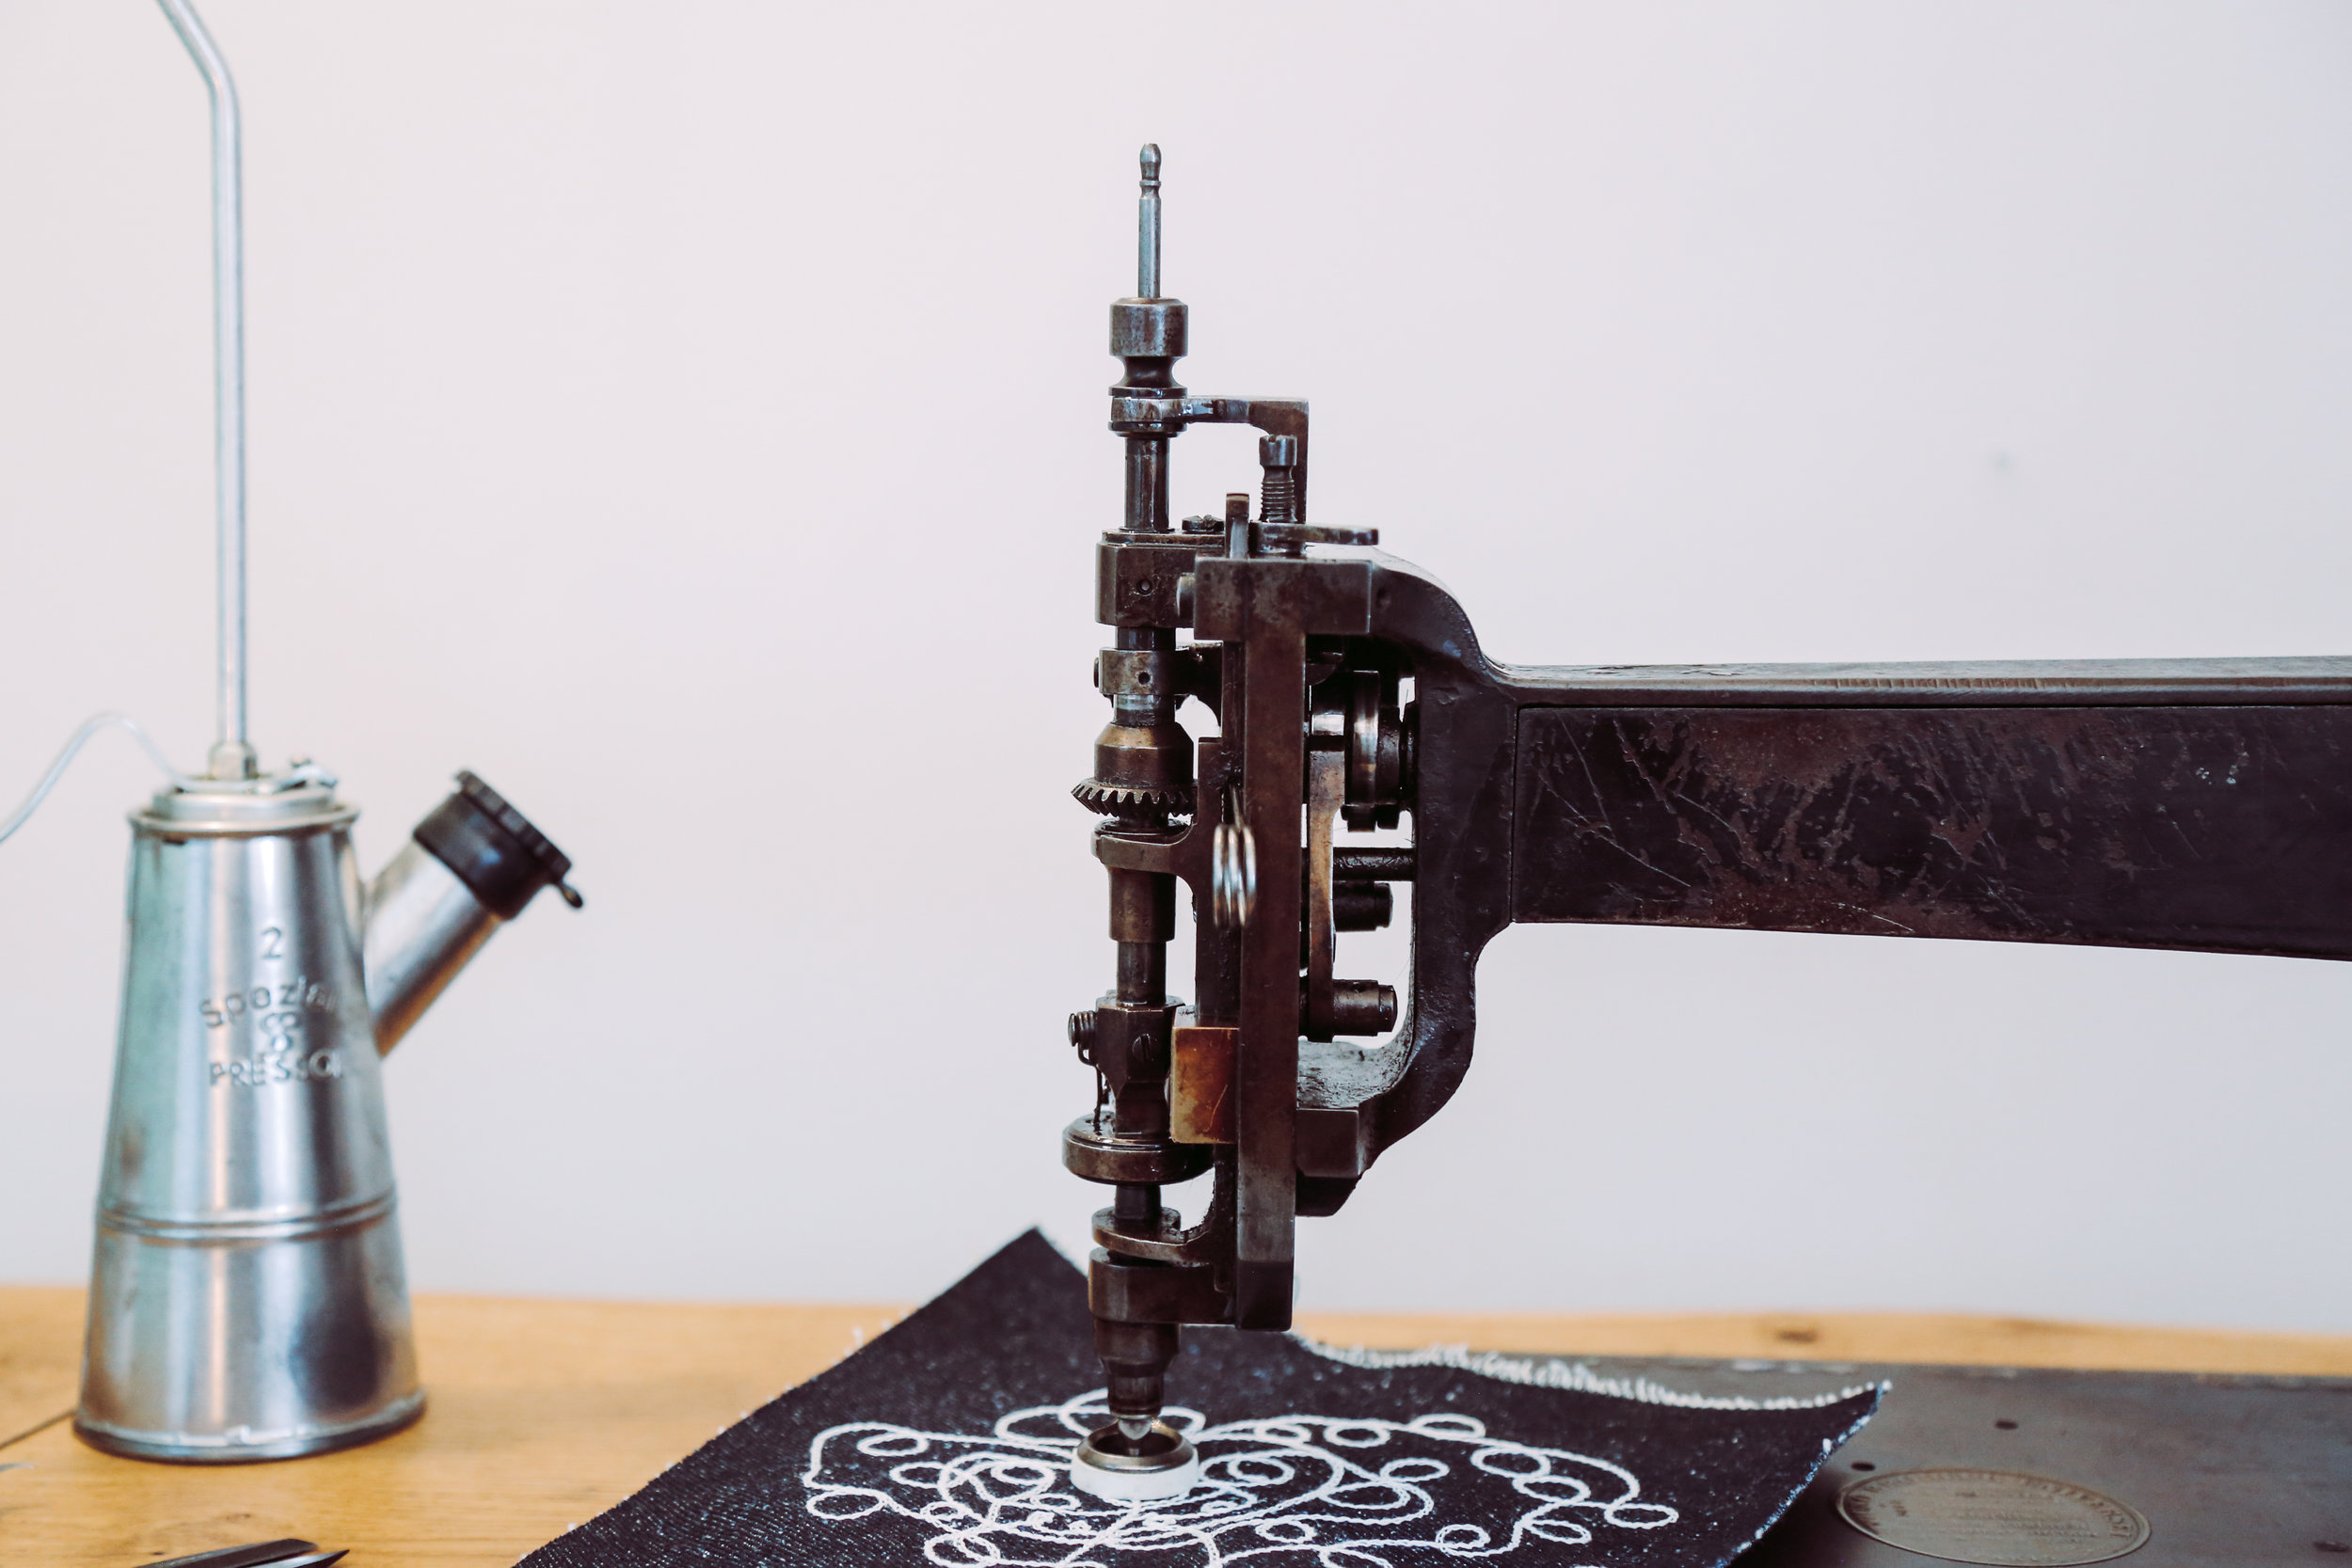 Chainstitch Machine Cornely A Singer114w103 Saintchains Artisan Embroidery